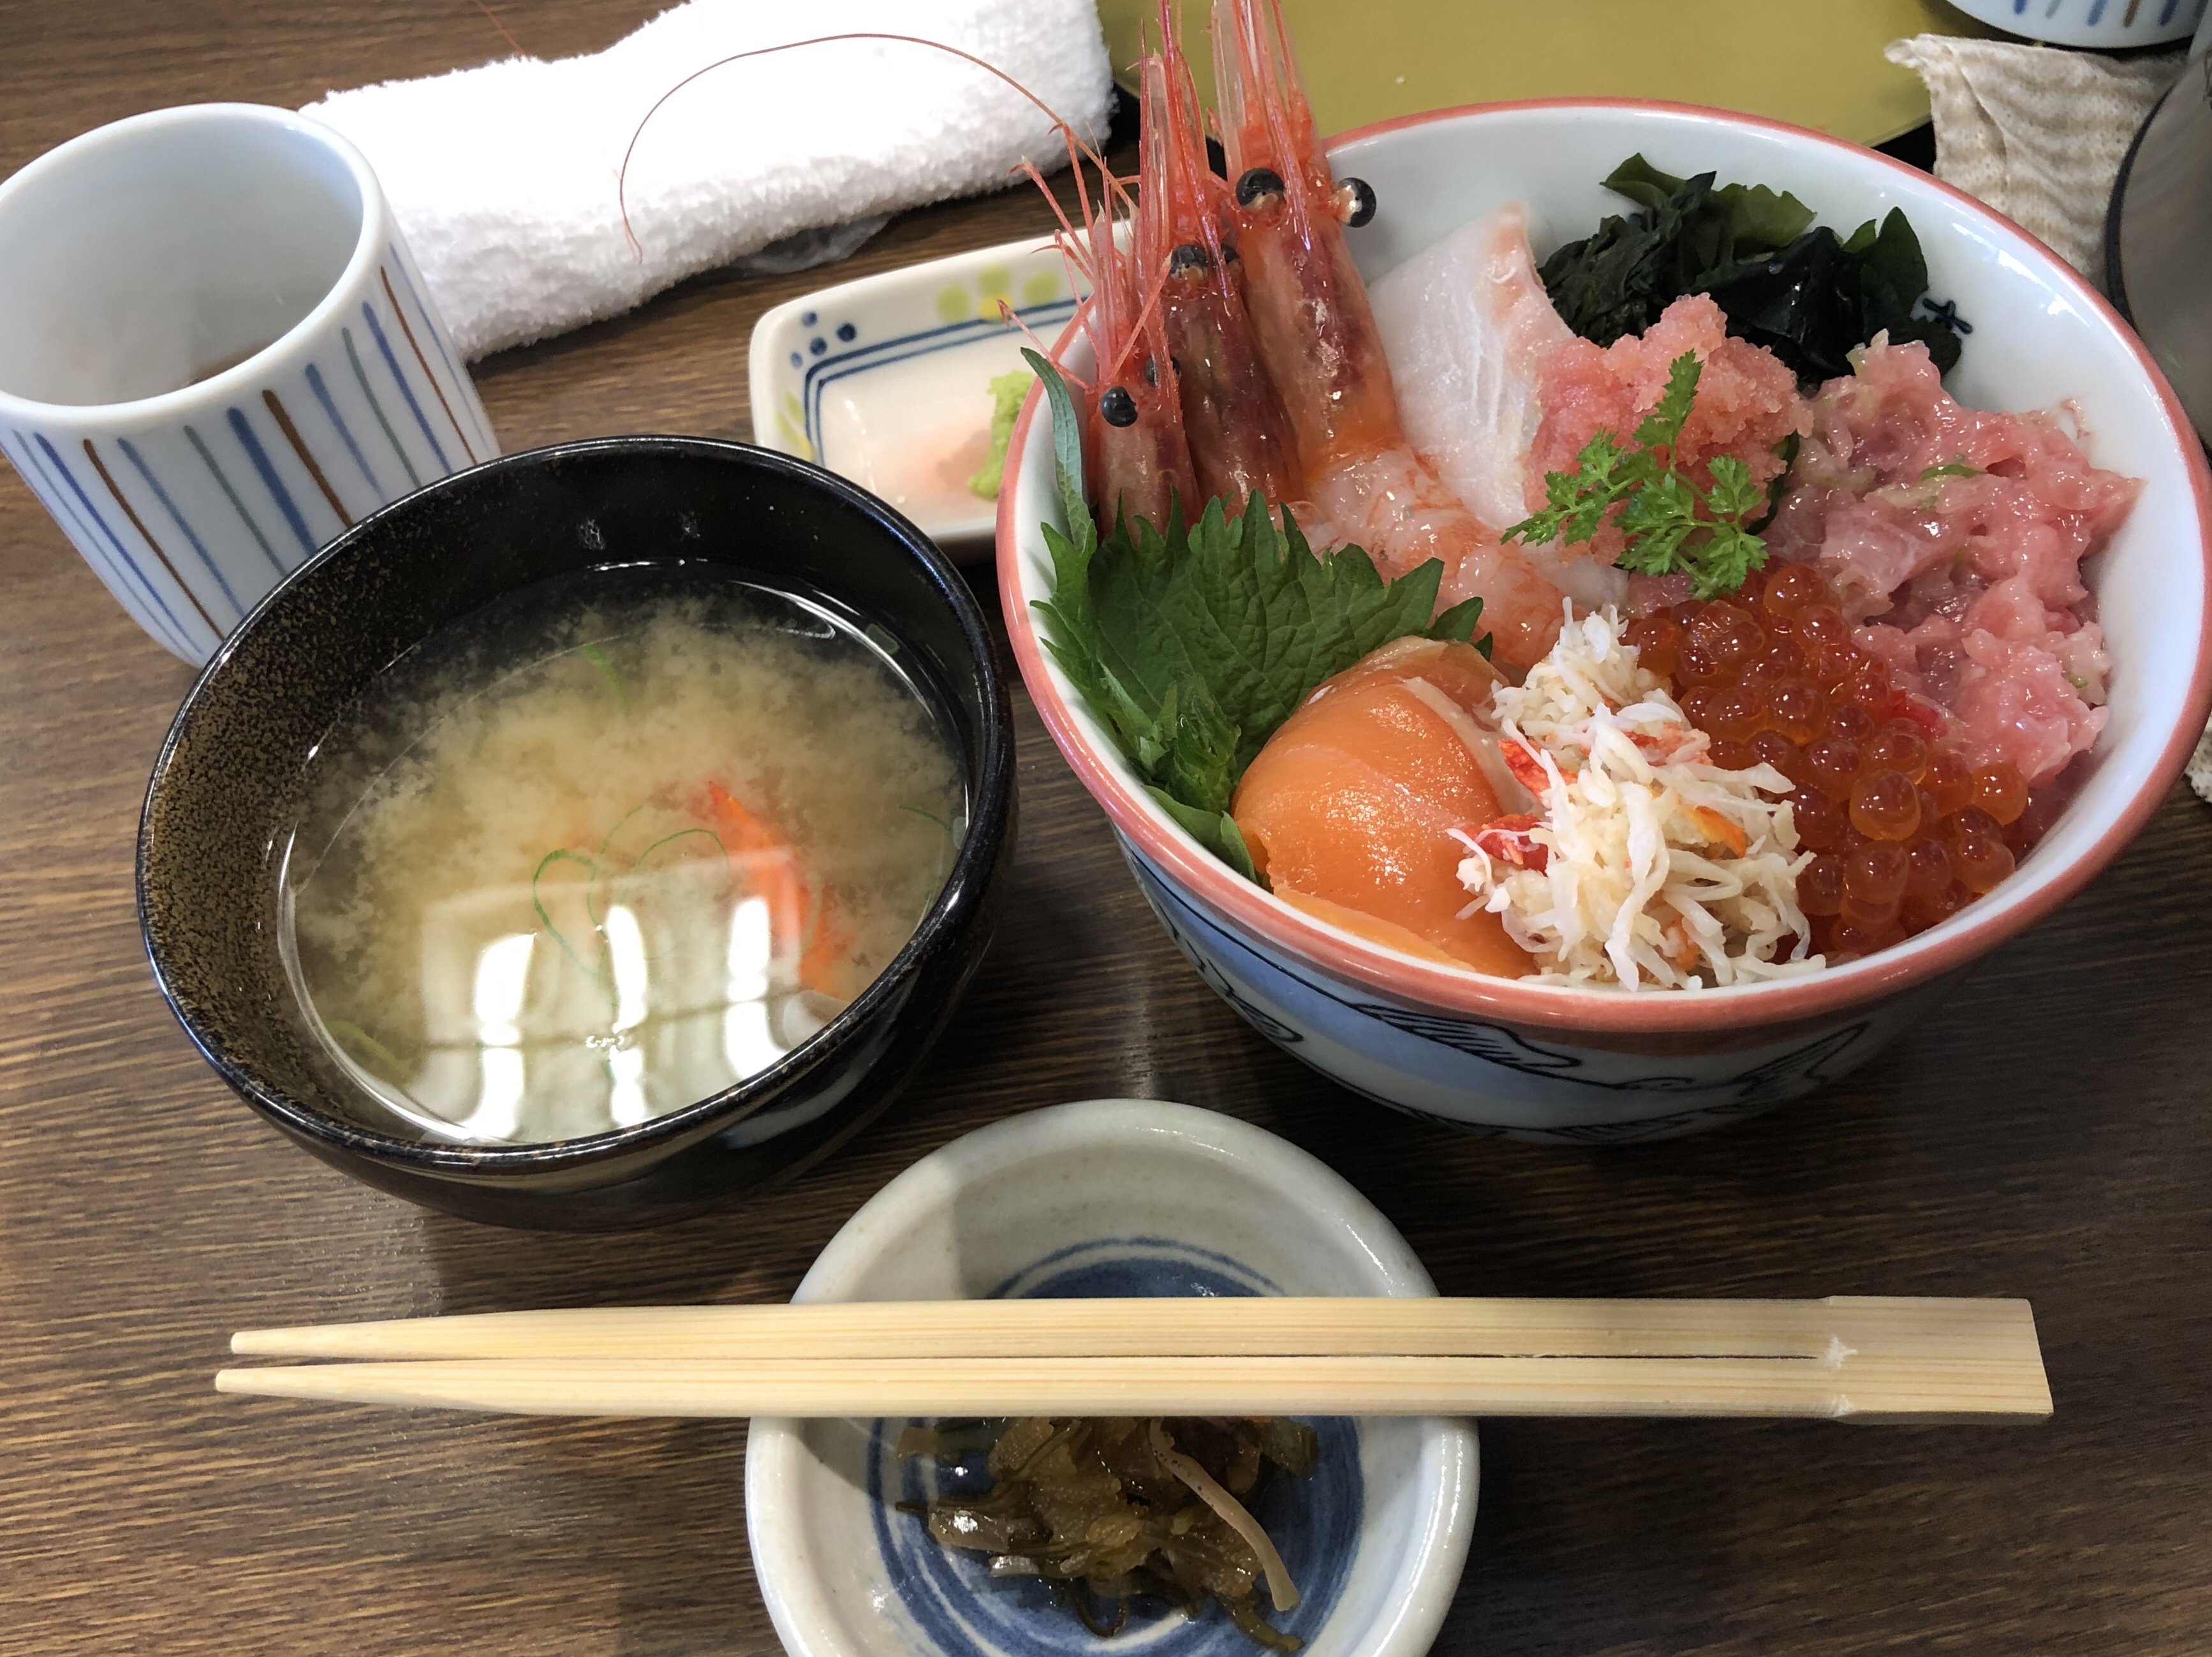 img 7409 1 - ナインハピネスプロ@in札幌合宿